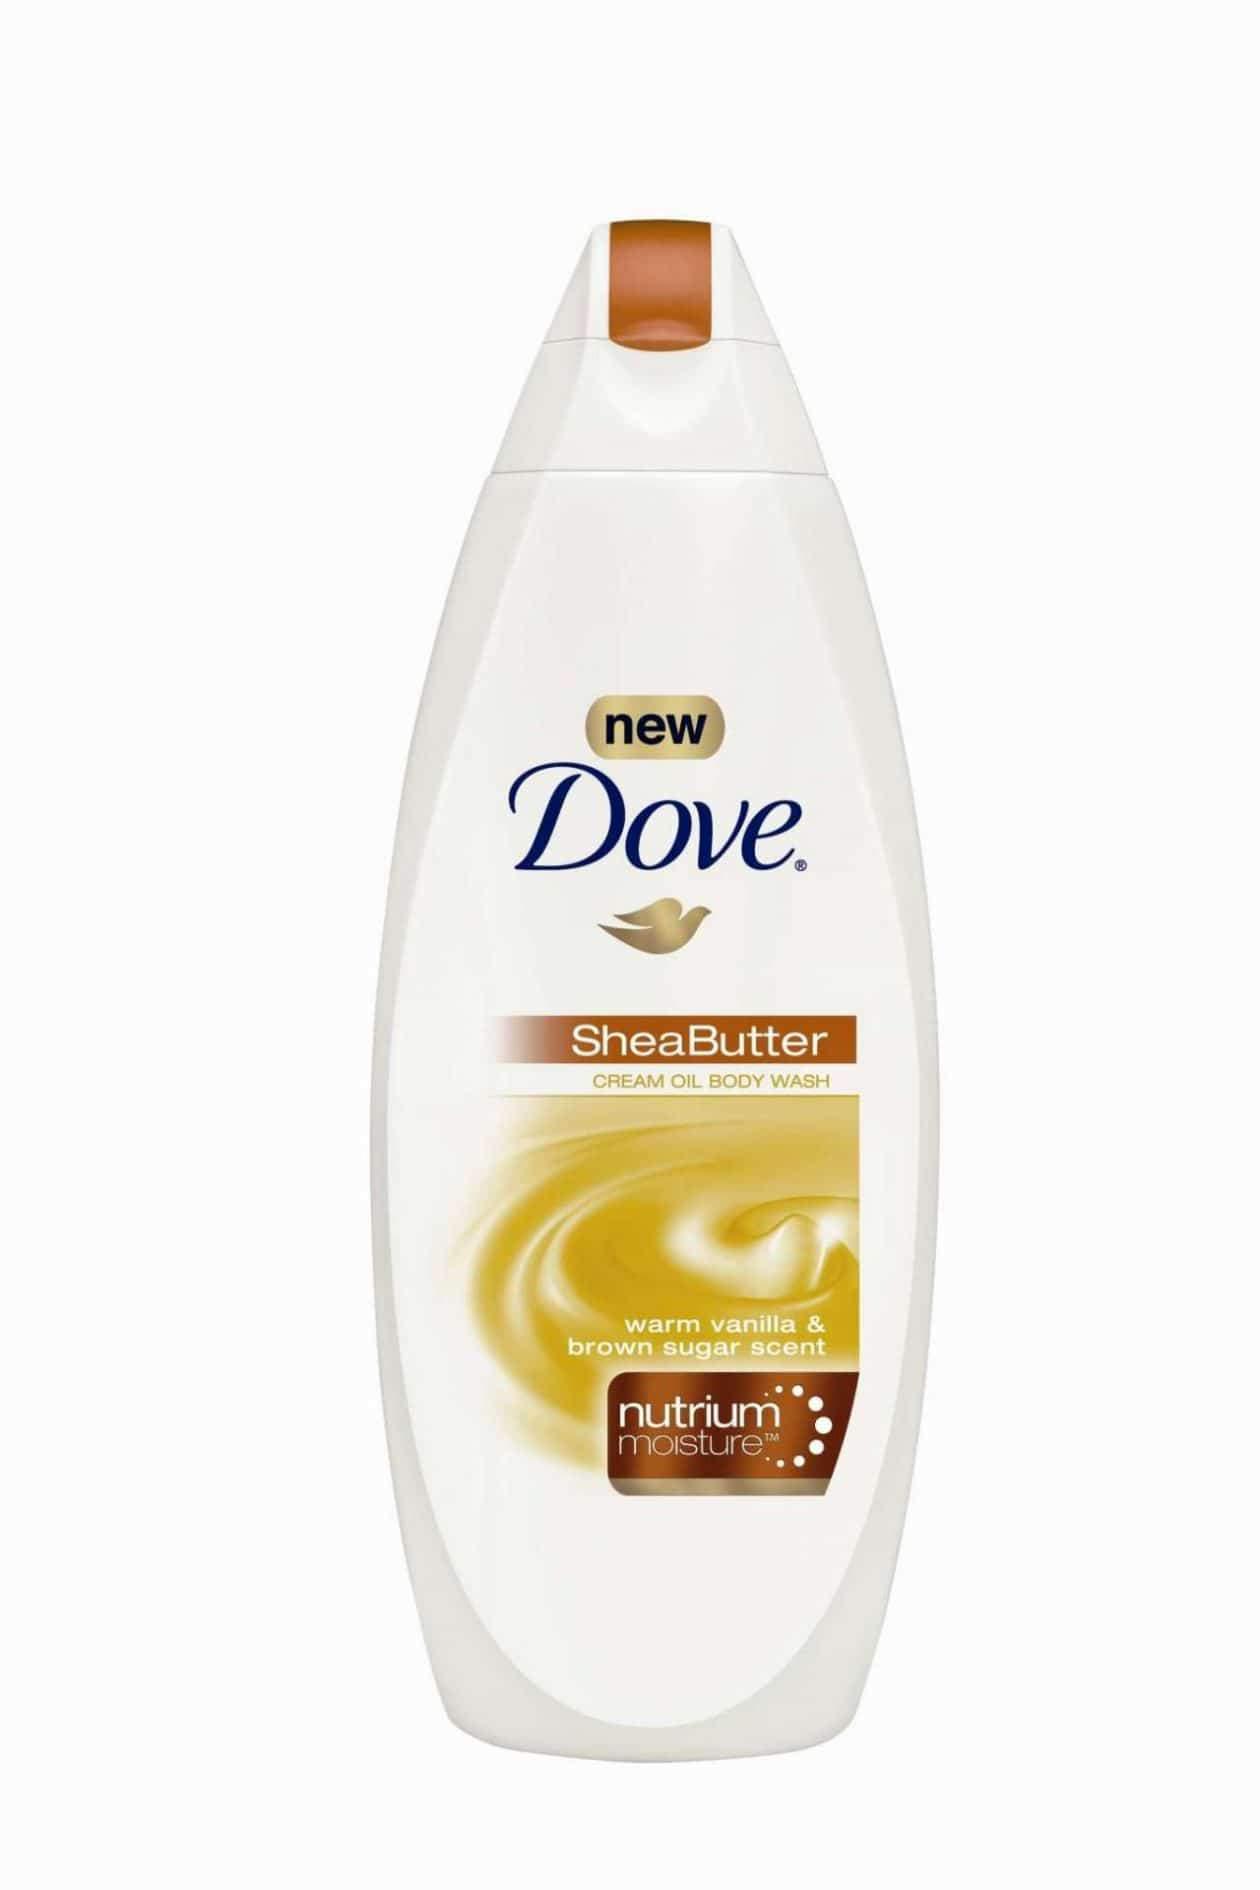 Dove Shea Butter Cream Oil Body Wash with Nutrium Moisture